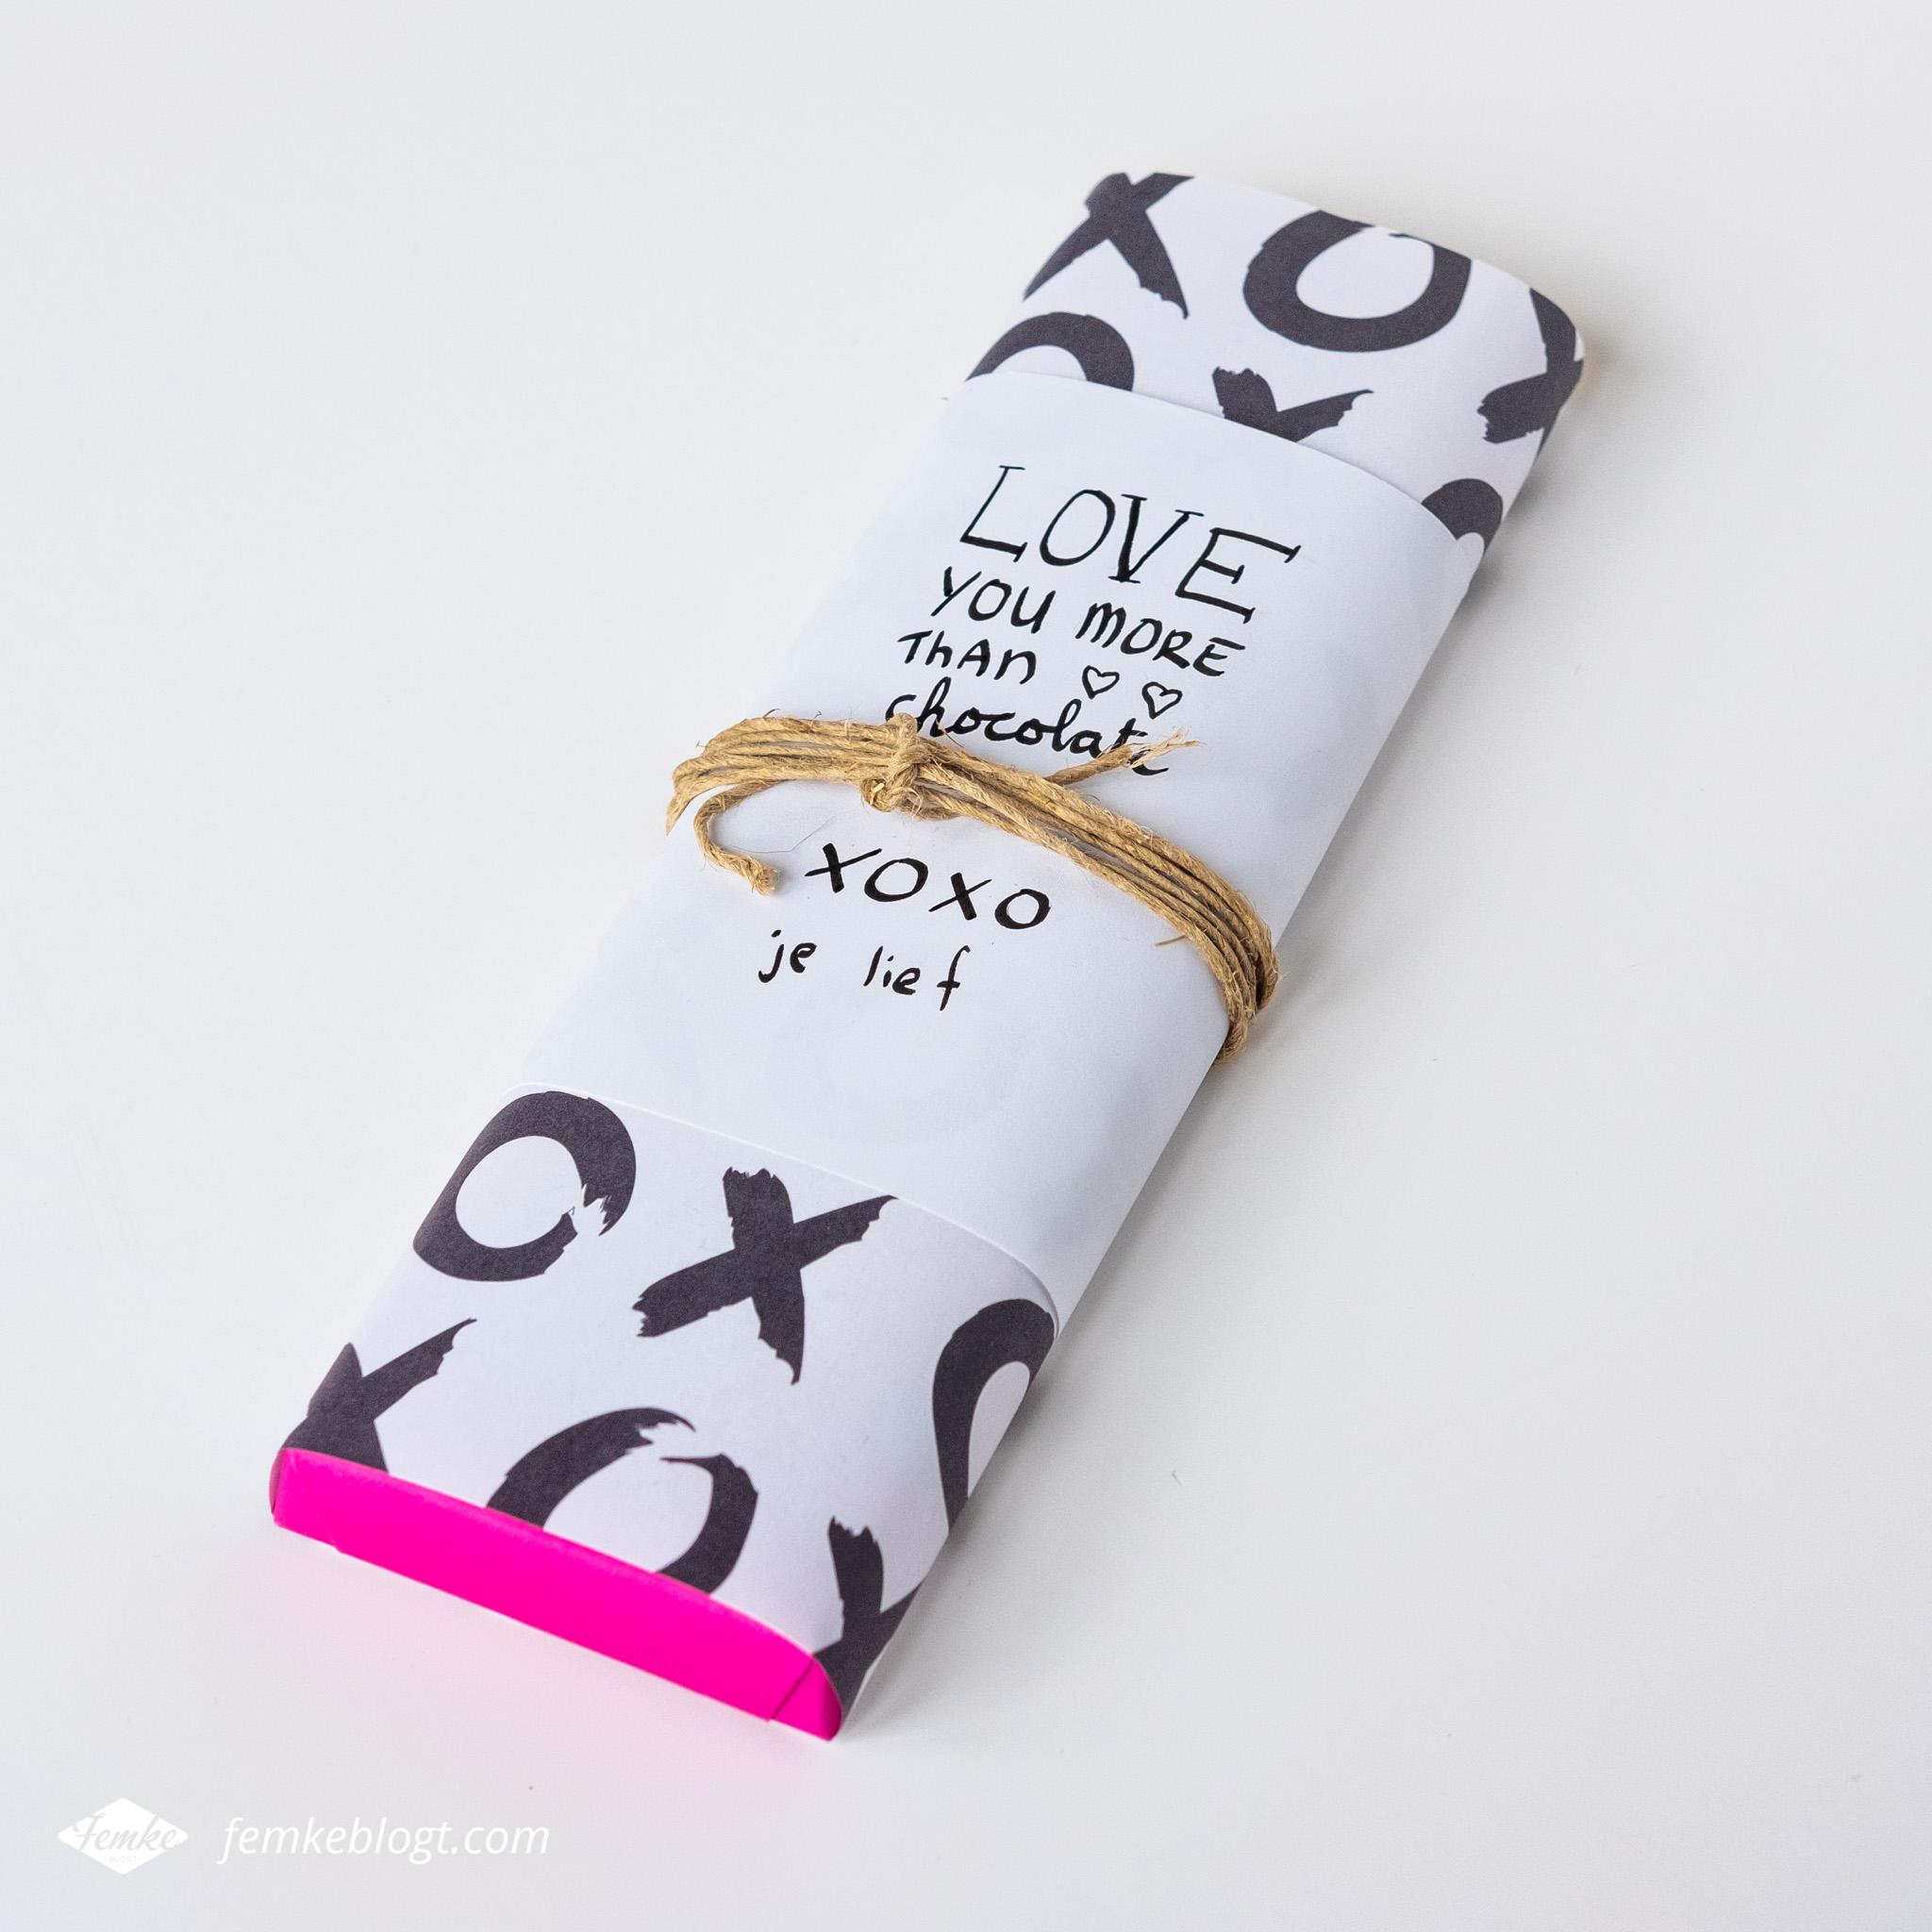 DIY Valentijnsdag chocoladewikkel met xoxo-patroon en quote 'love you more than chocolate'